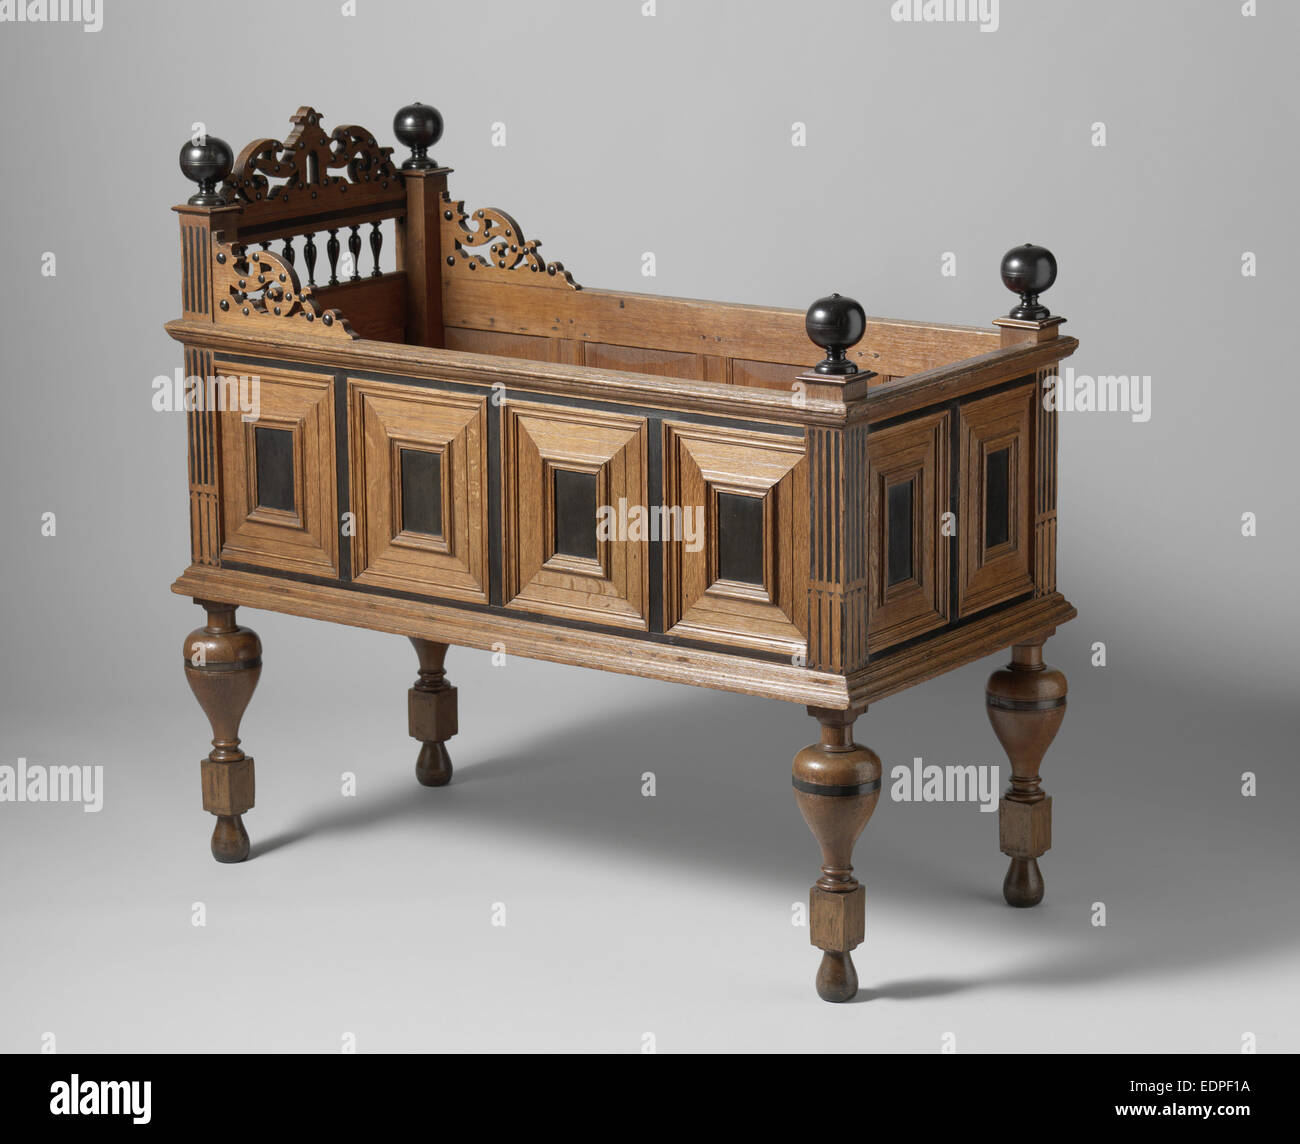 Des Kindes Kinderbett, anonym, c. 1620 - c. 1650 Stockbild